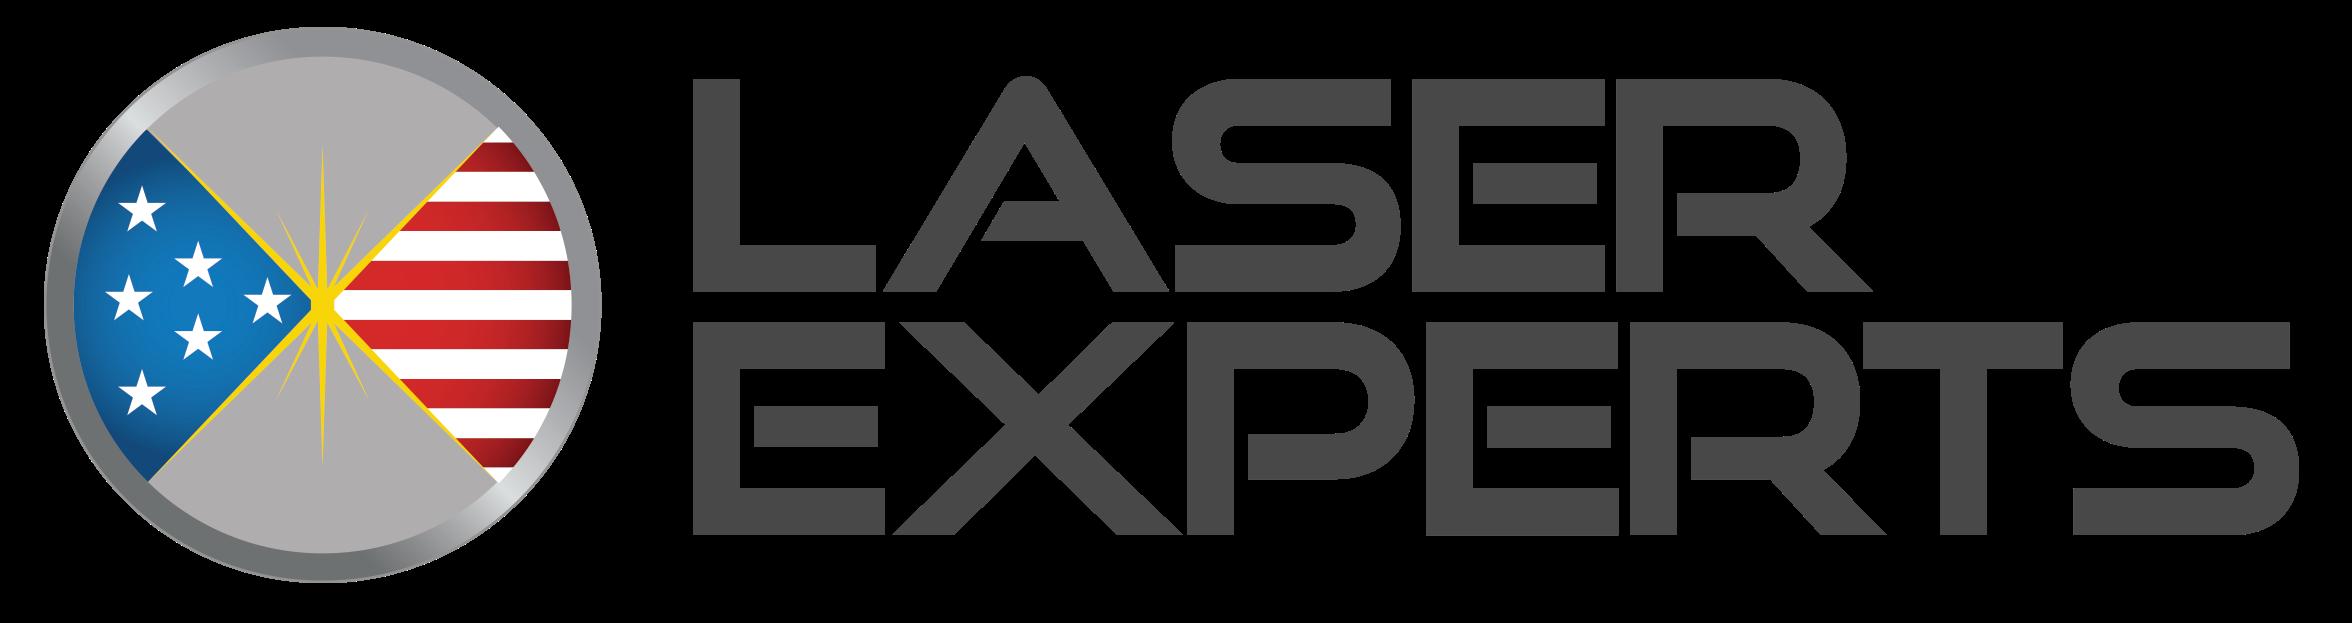 Laserexperts